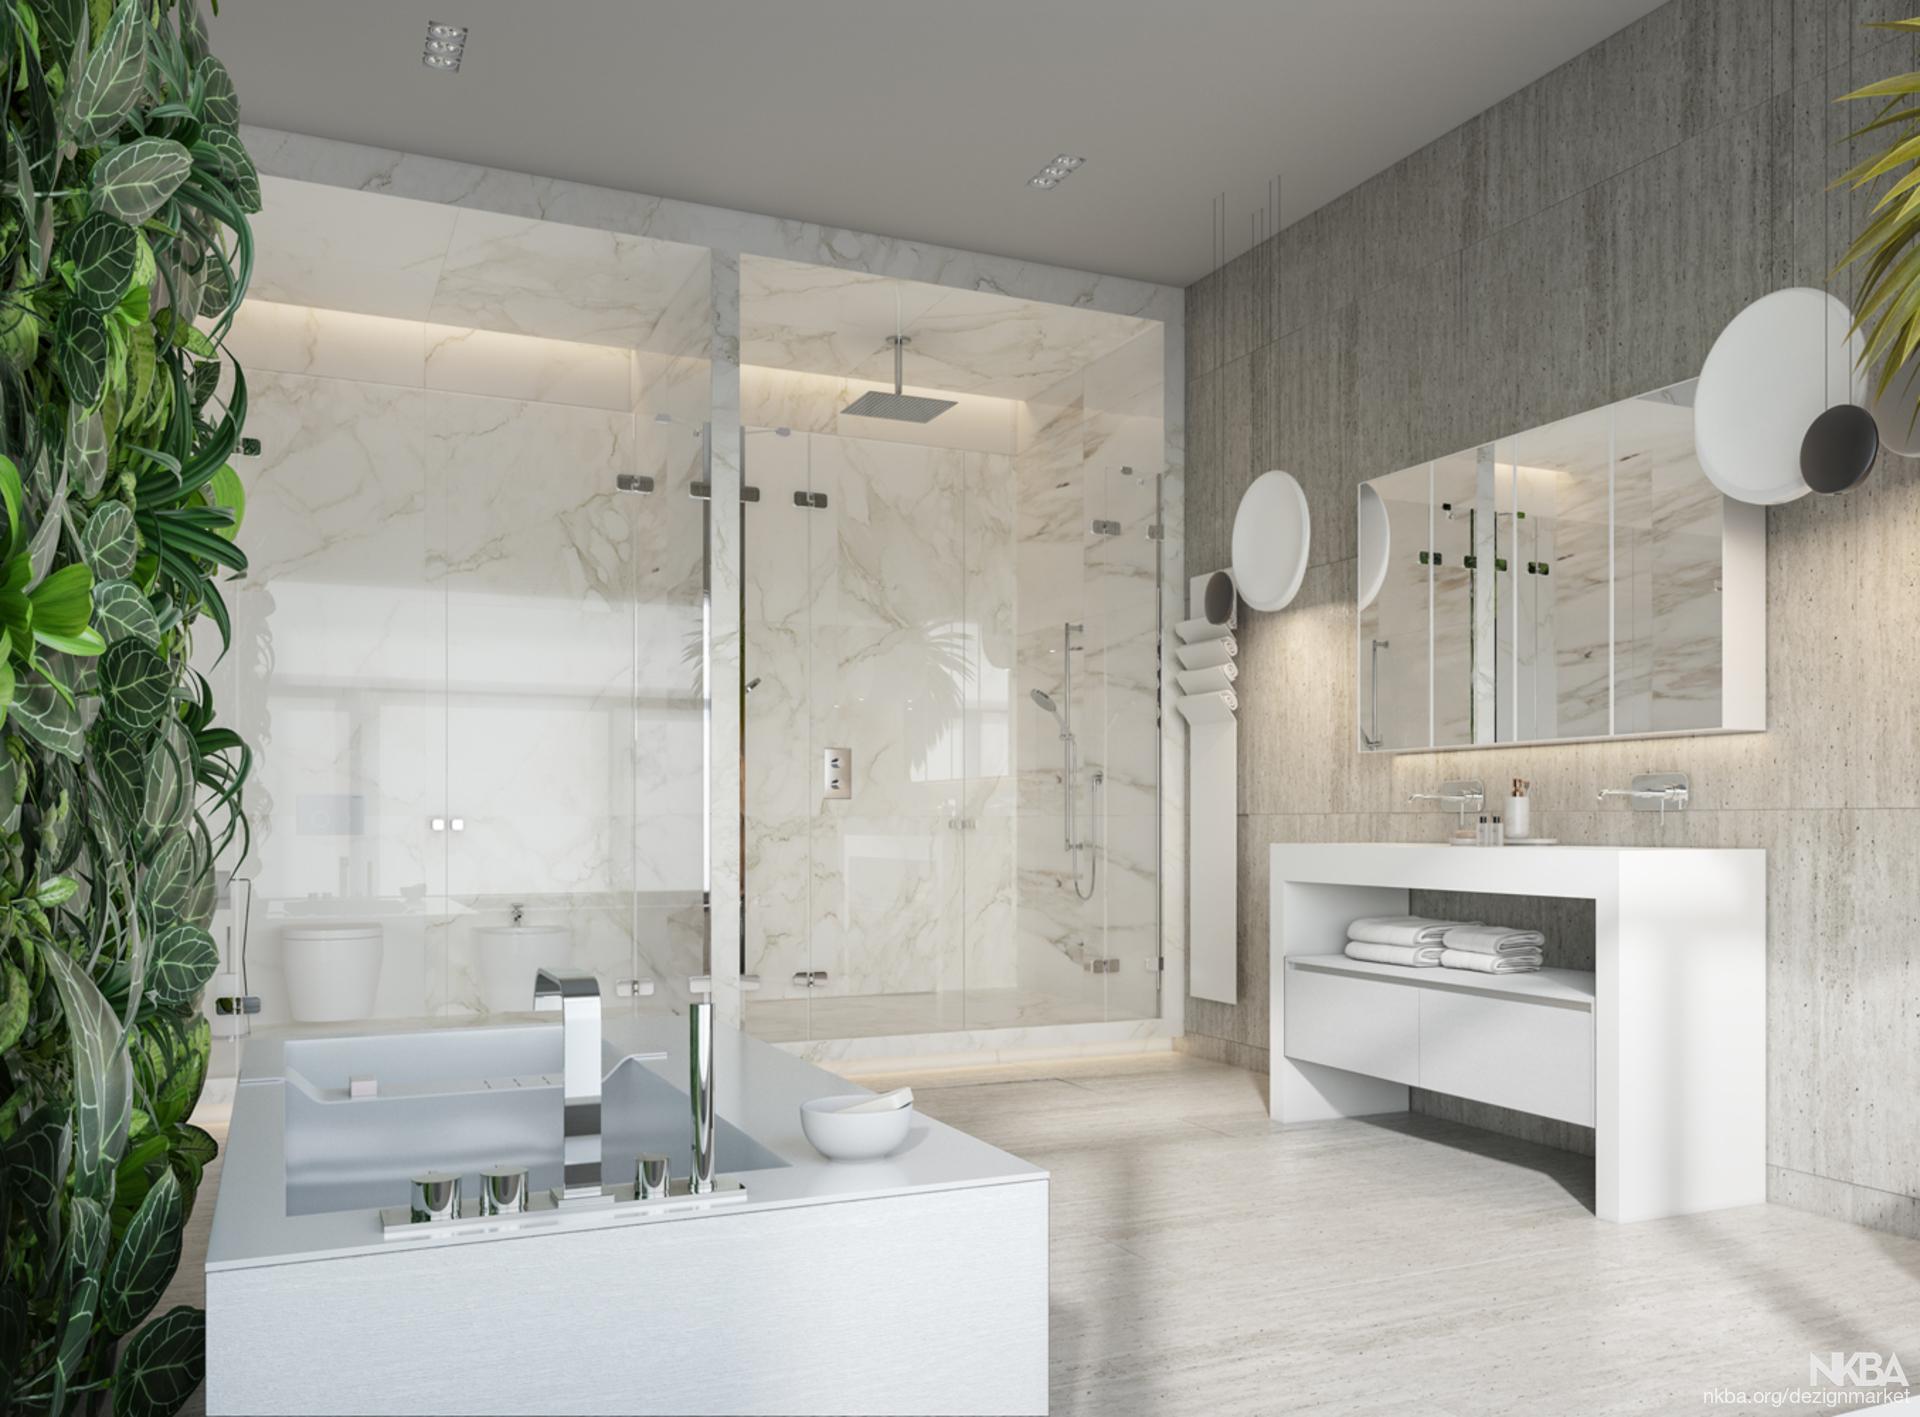 MODERN MASTER BATH DESIGN - NKBA